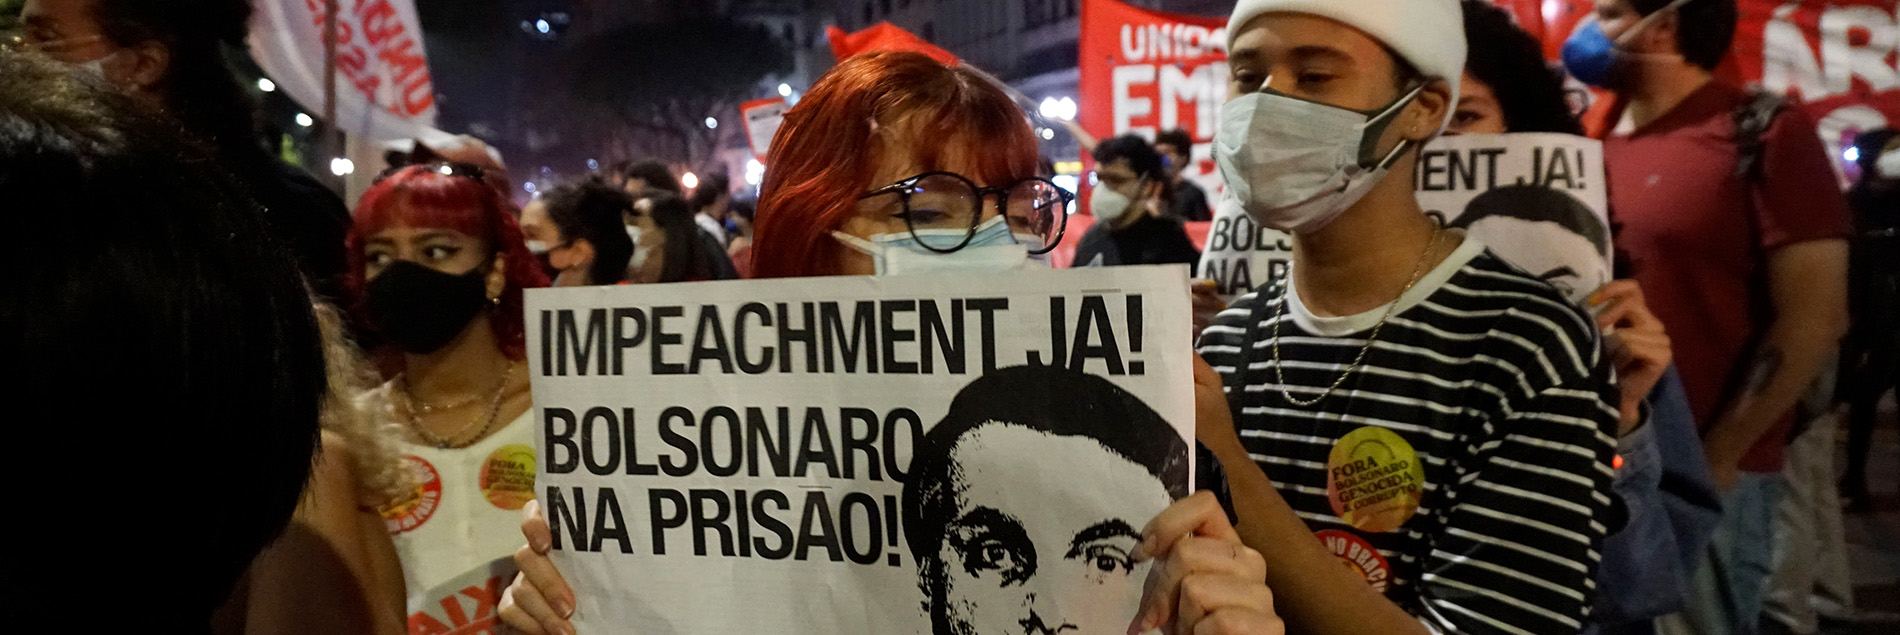 protestas conta jair bolsonaro en brasil